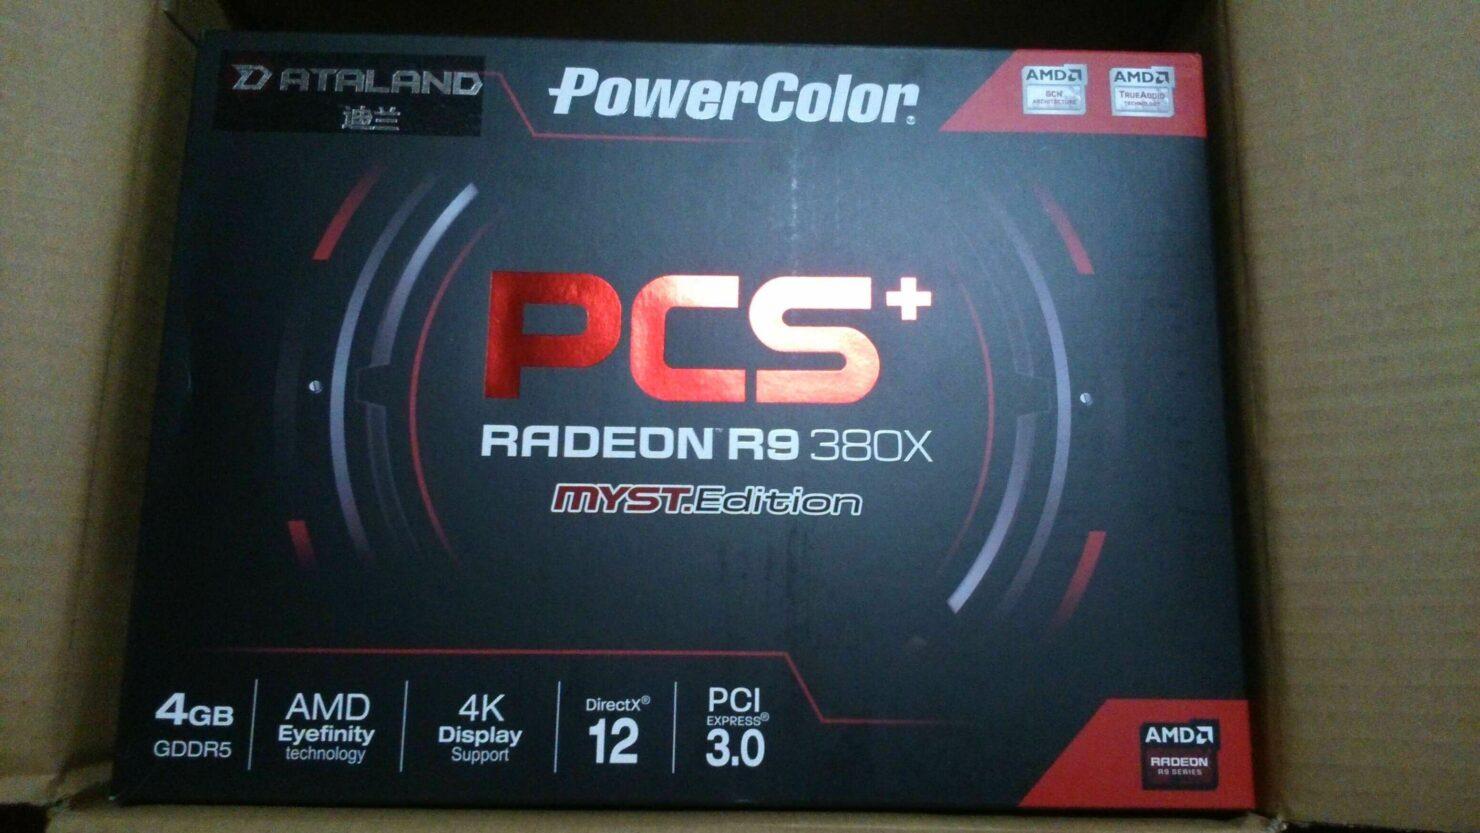 powercolor-radeon-r9-380x-pcs_1